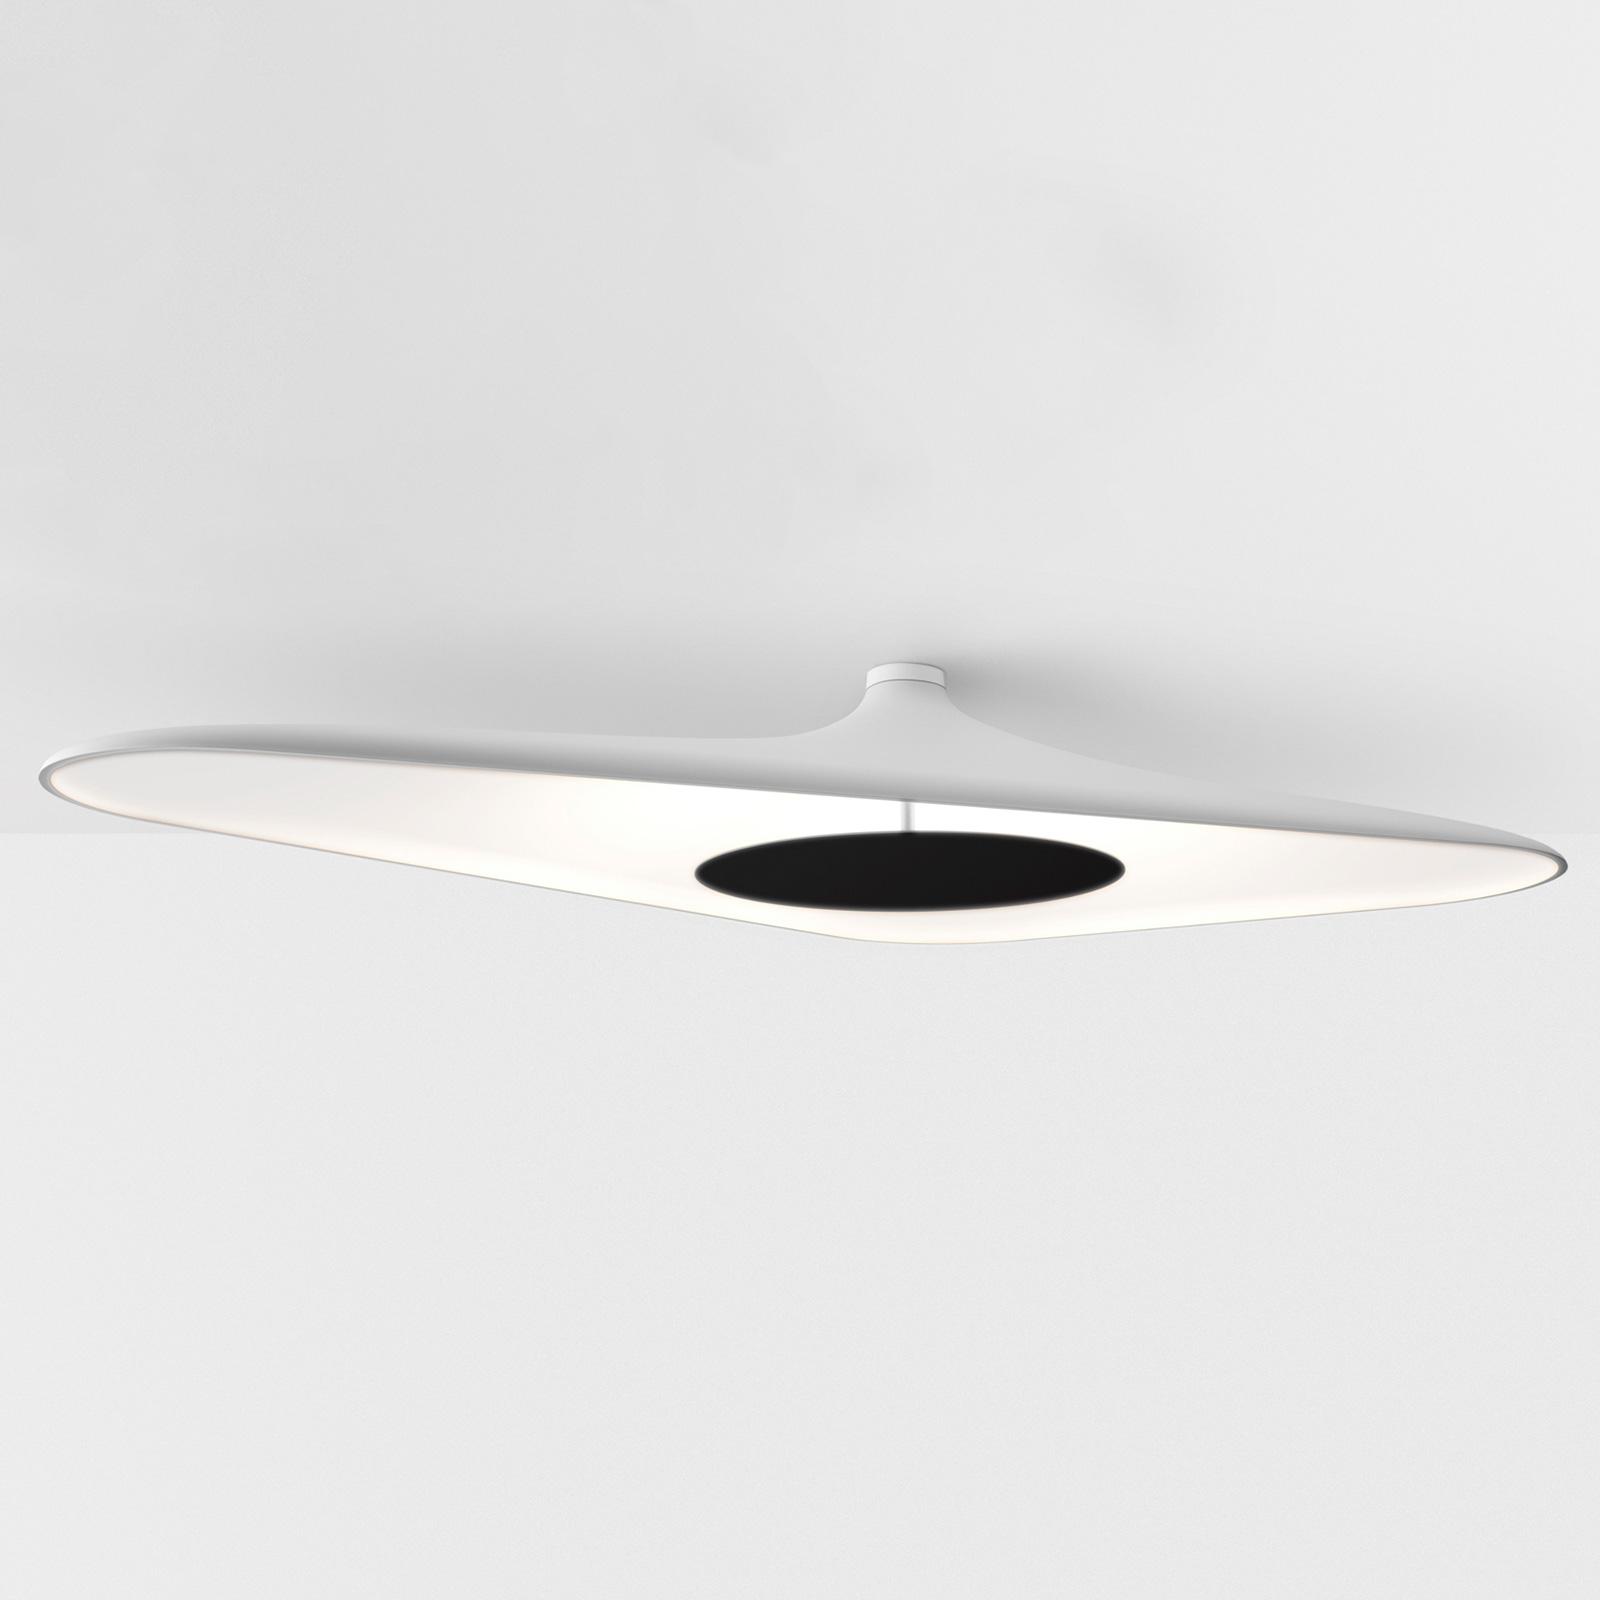 Luceplan Soleil Noir LED plafondlamp, wit